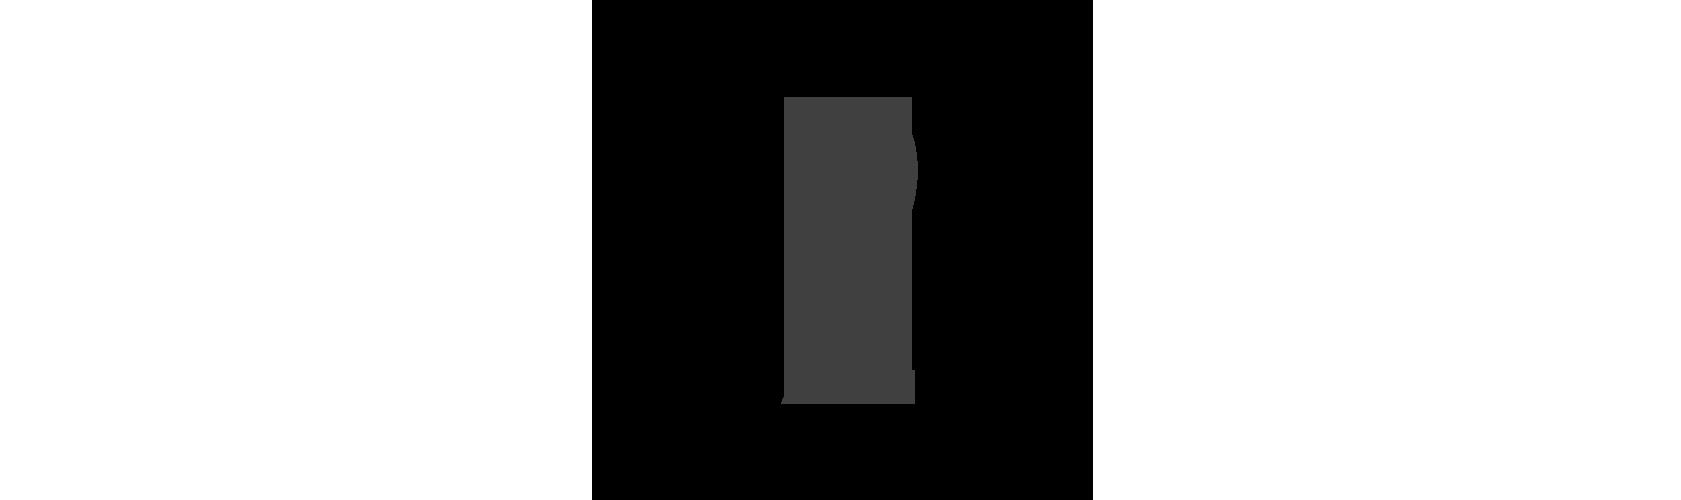 Circle 2 (Medium).png